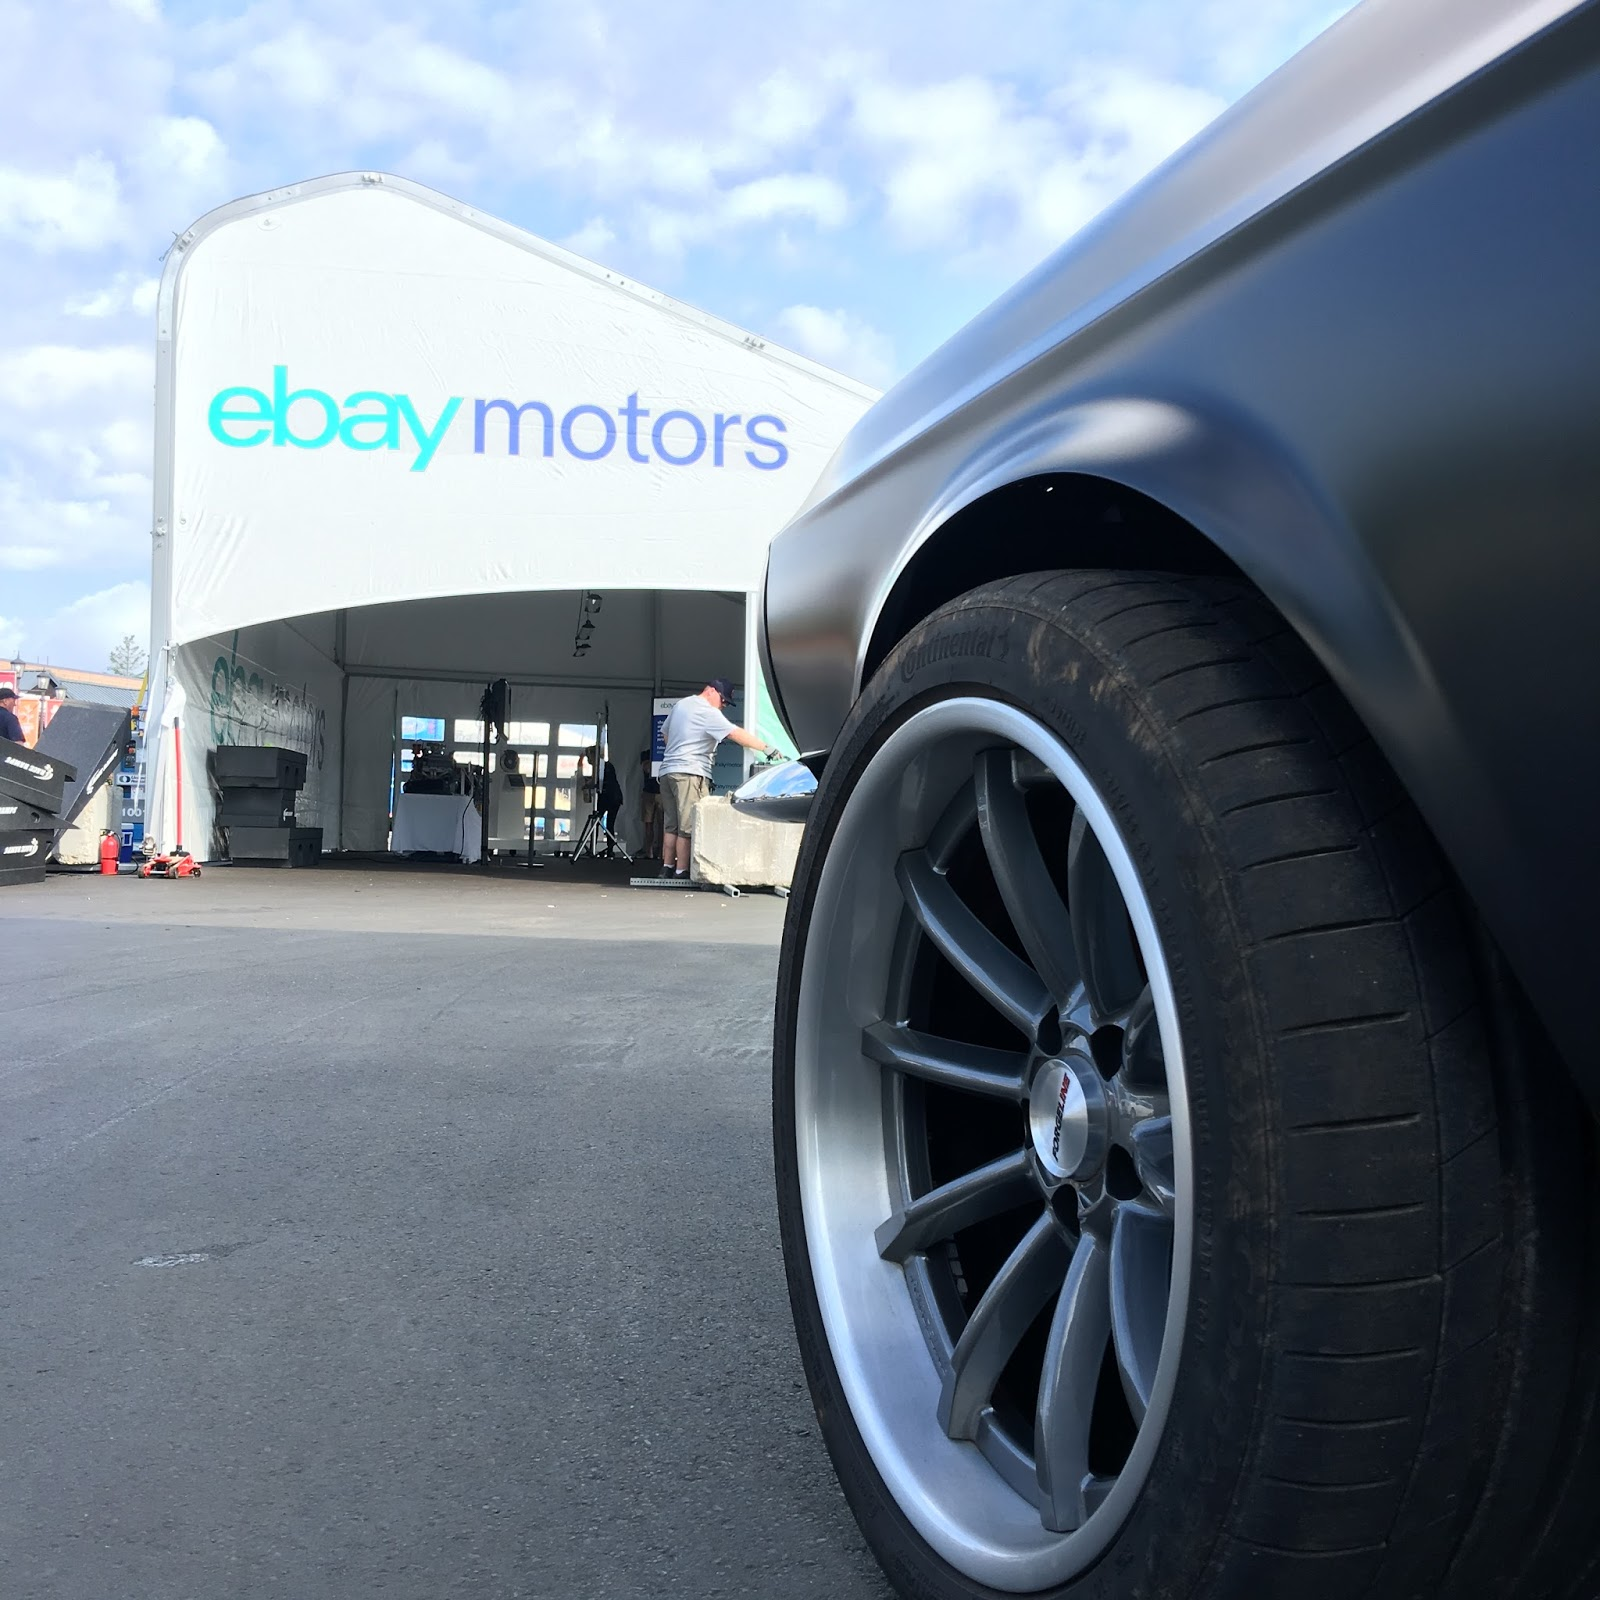 Woodward Dream Cruise with eBay Motors - TheGentlemanRacer.com